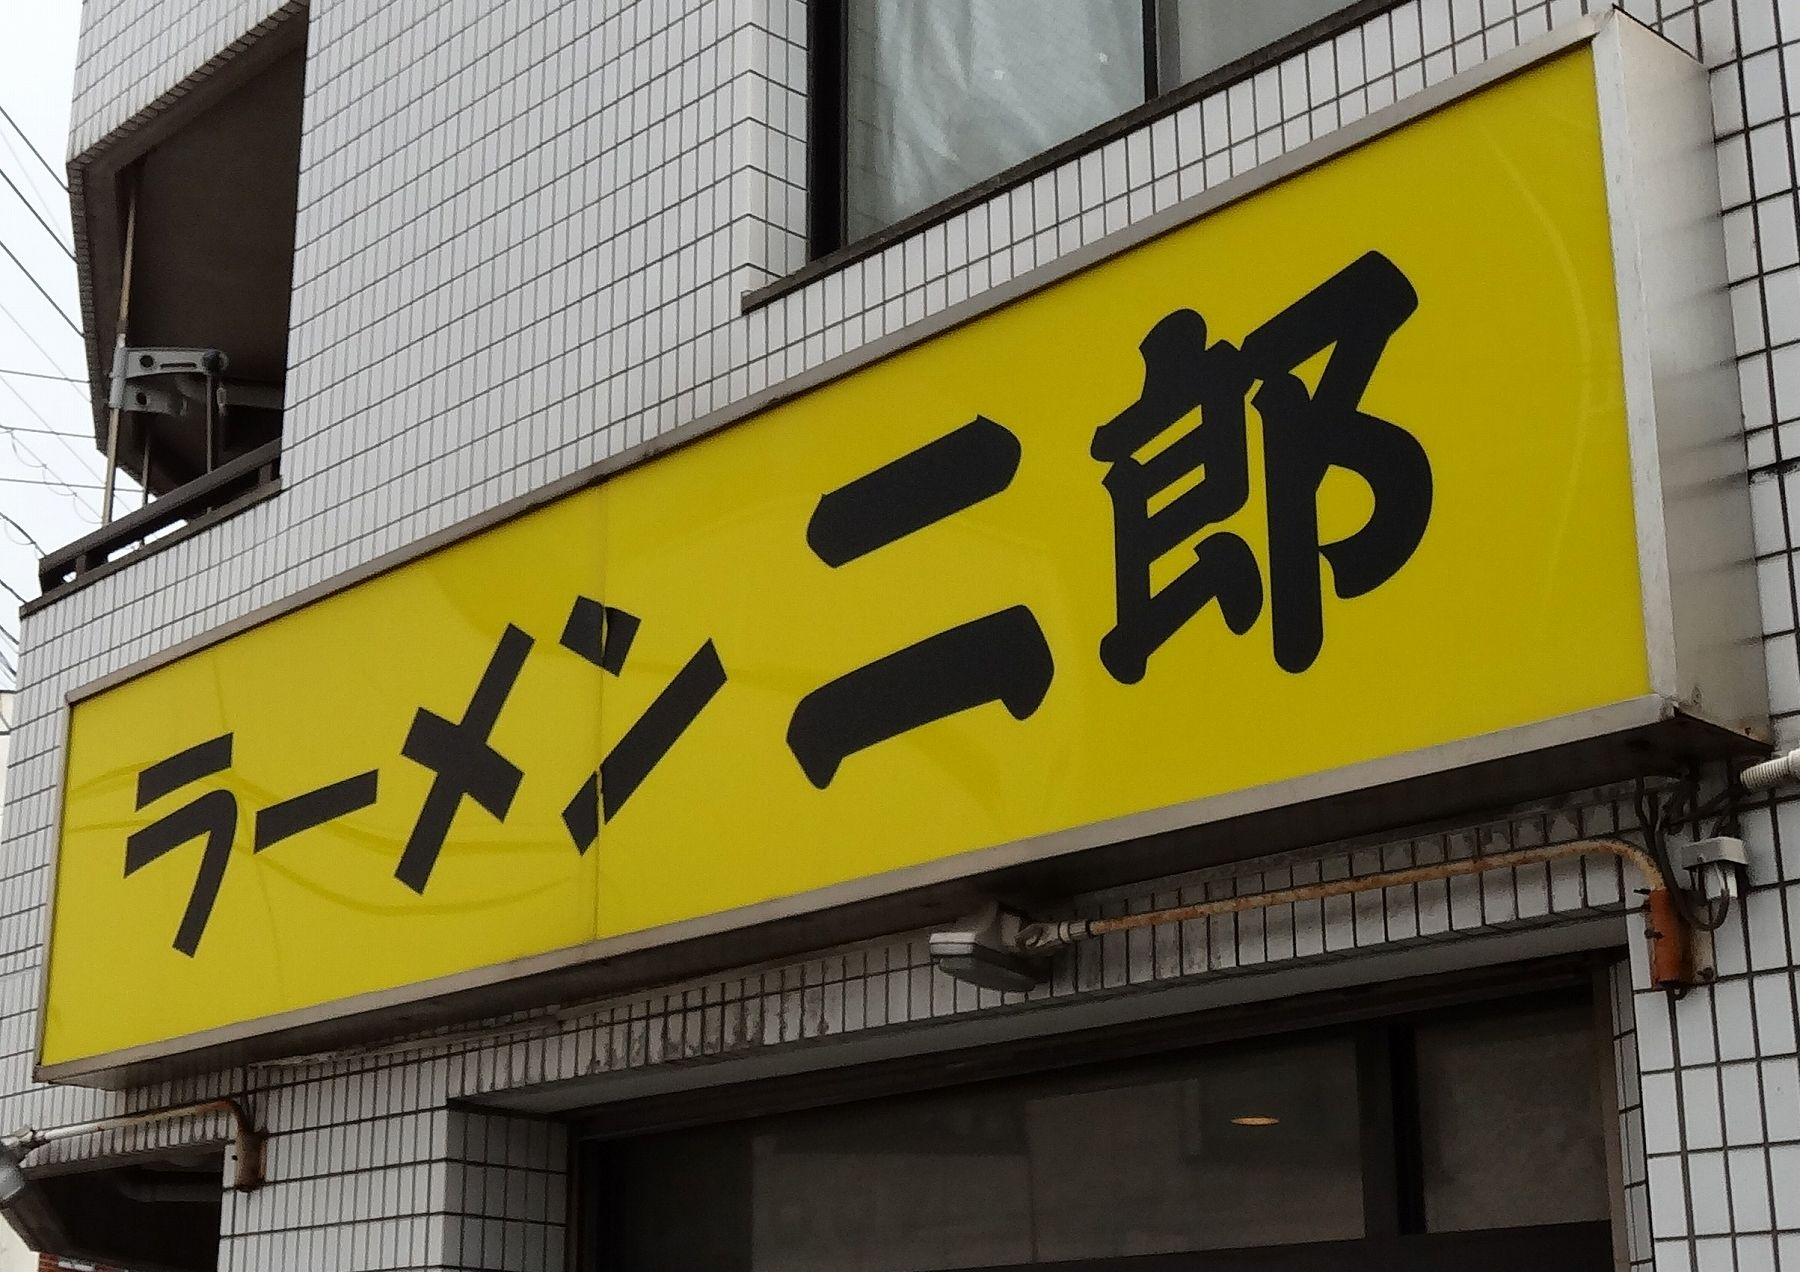 20120921001kameido.jpg